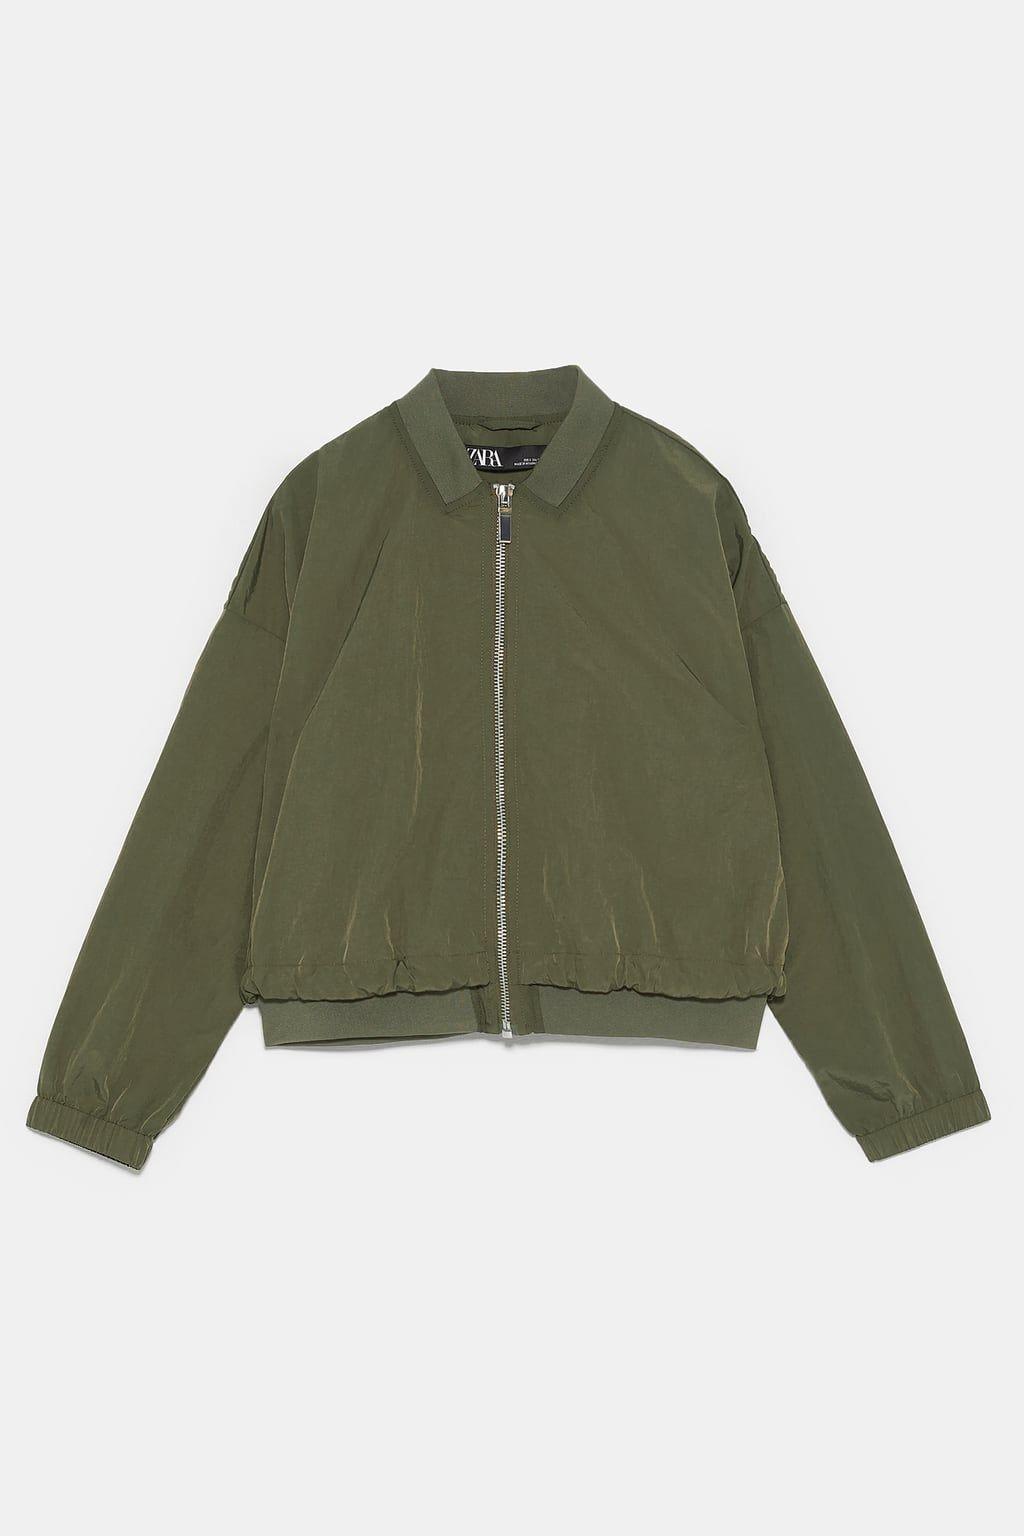 cd7e1722f Contrast bomber jacket in 2019 | Spring 20 PJ | Jackets, Bomber ...